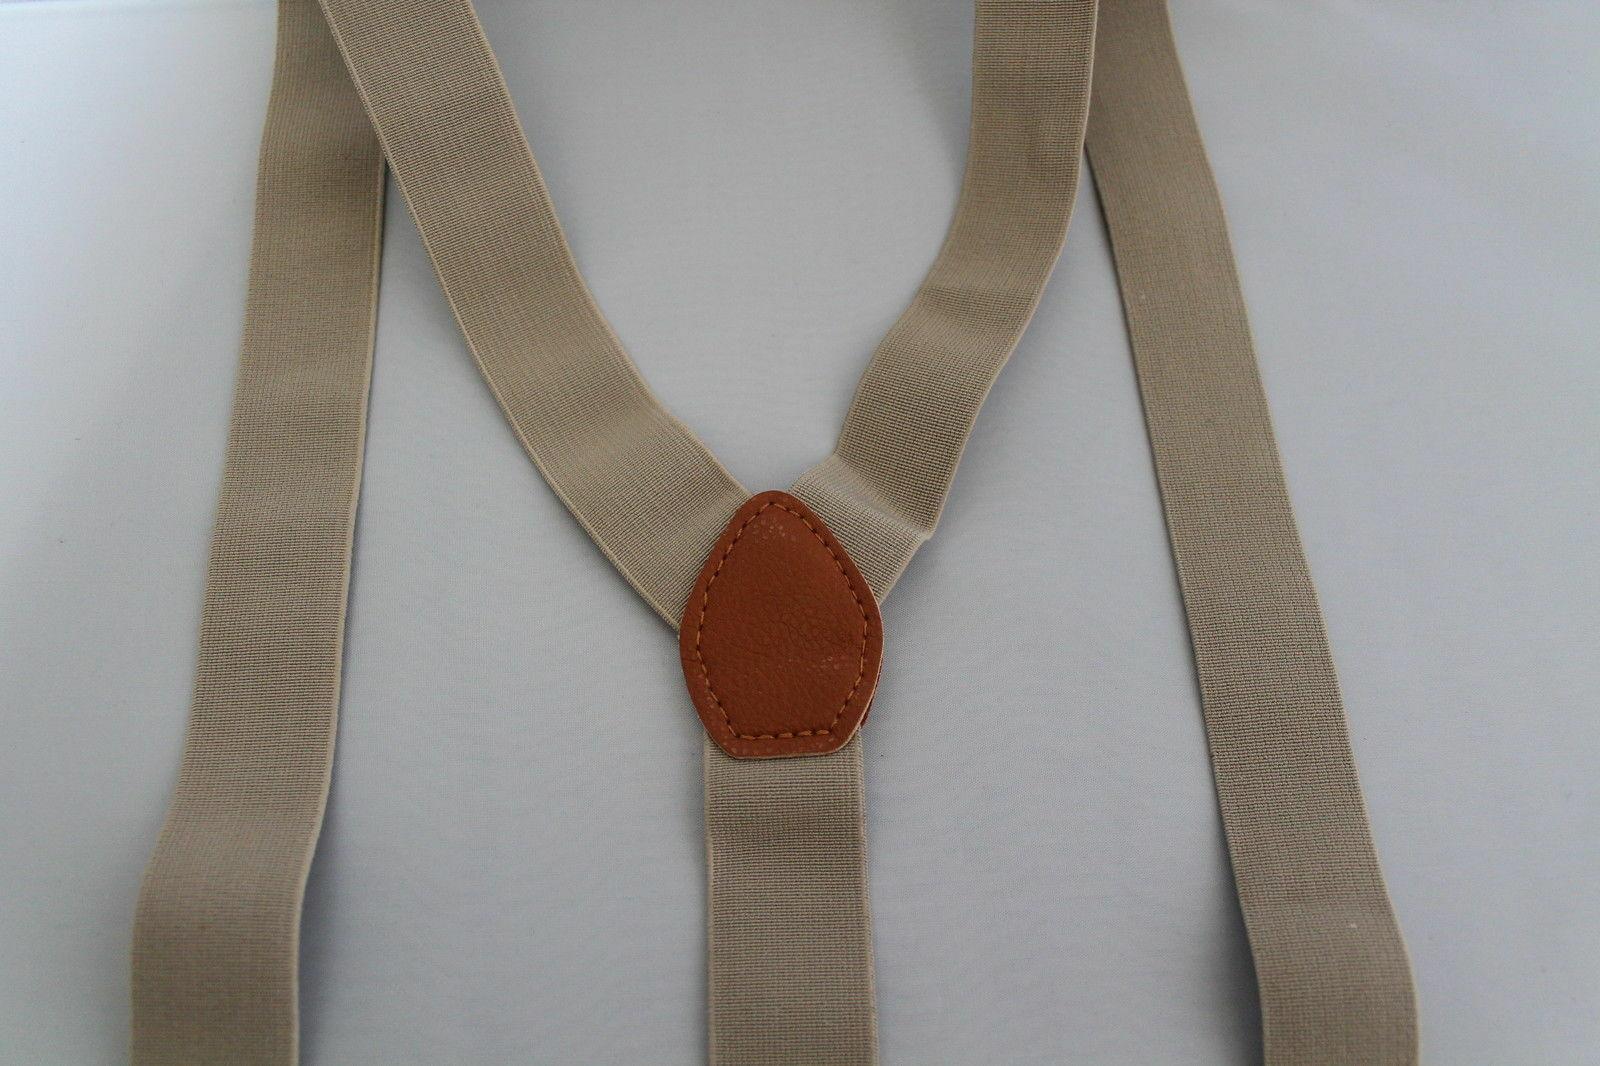 Beige Unisex Suspender Braces Adjustable Leather Button Holes Lycra/Elastane UK image 5